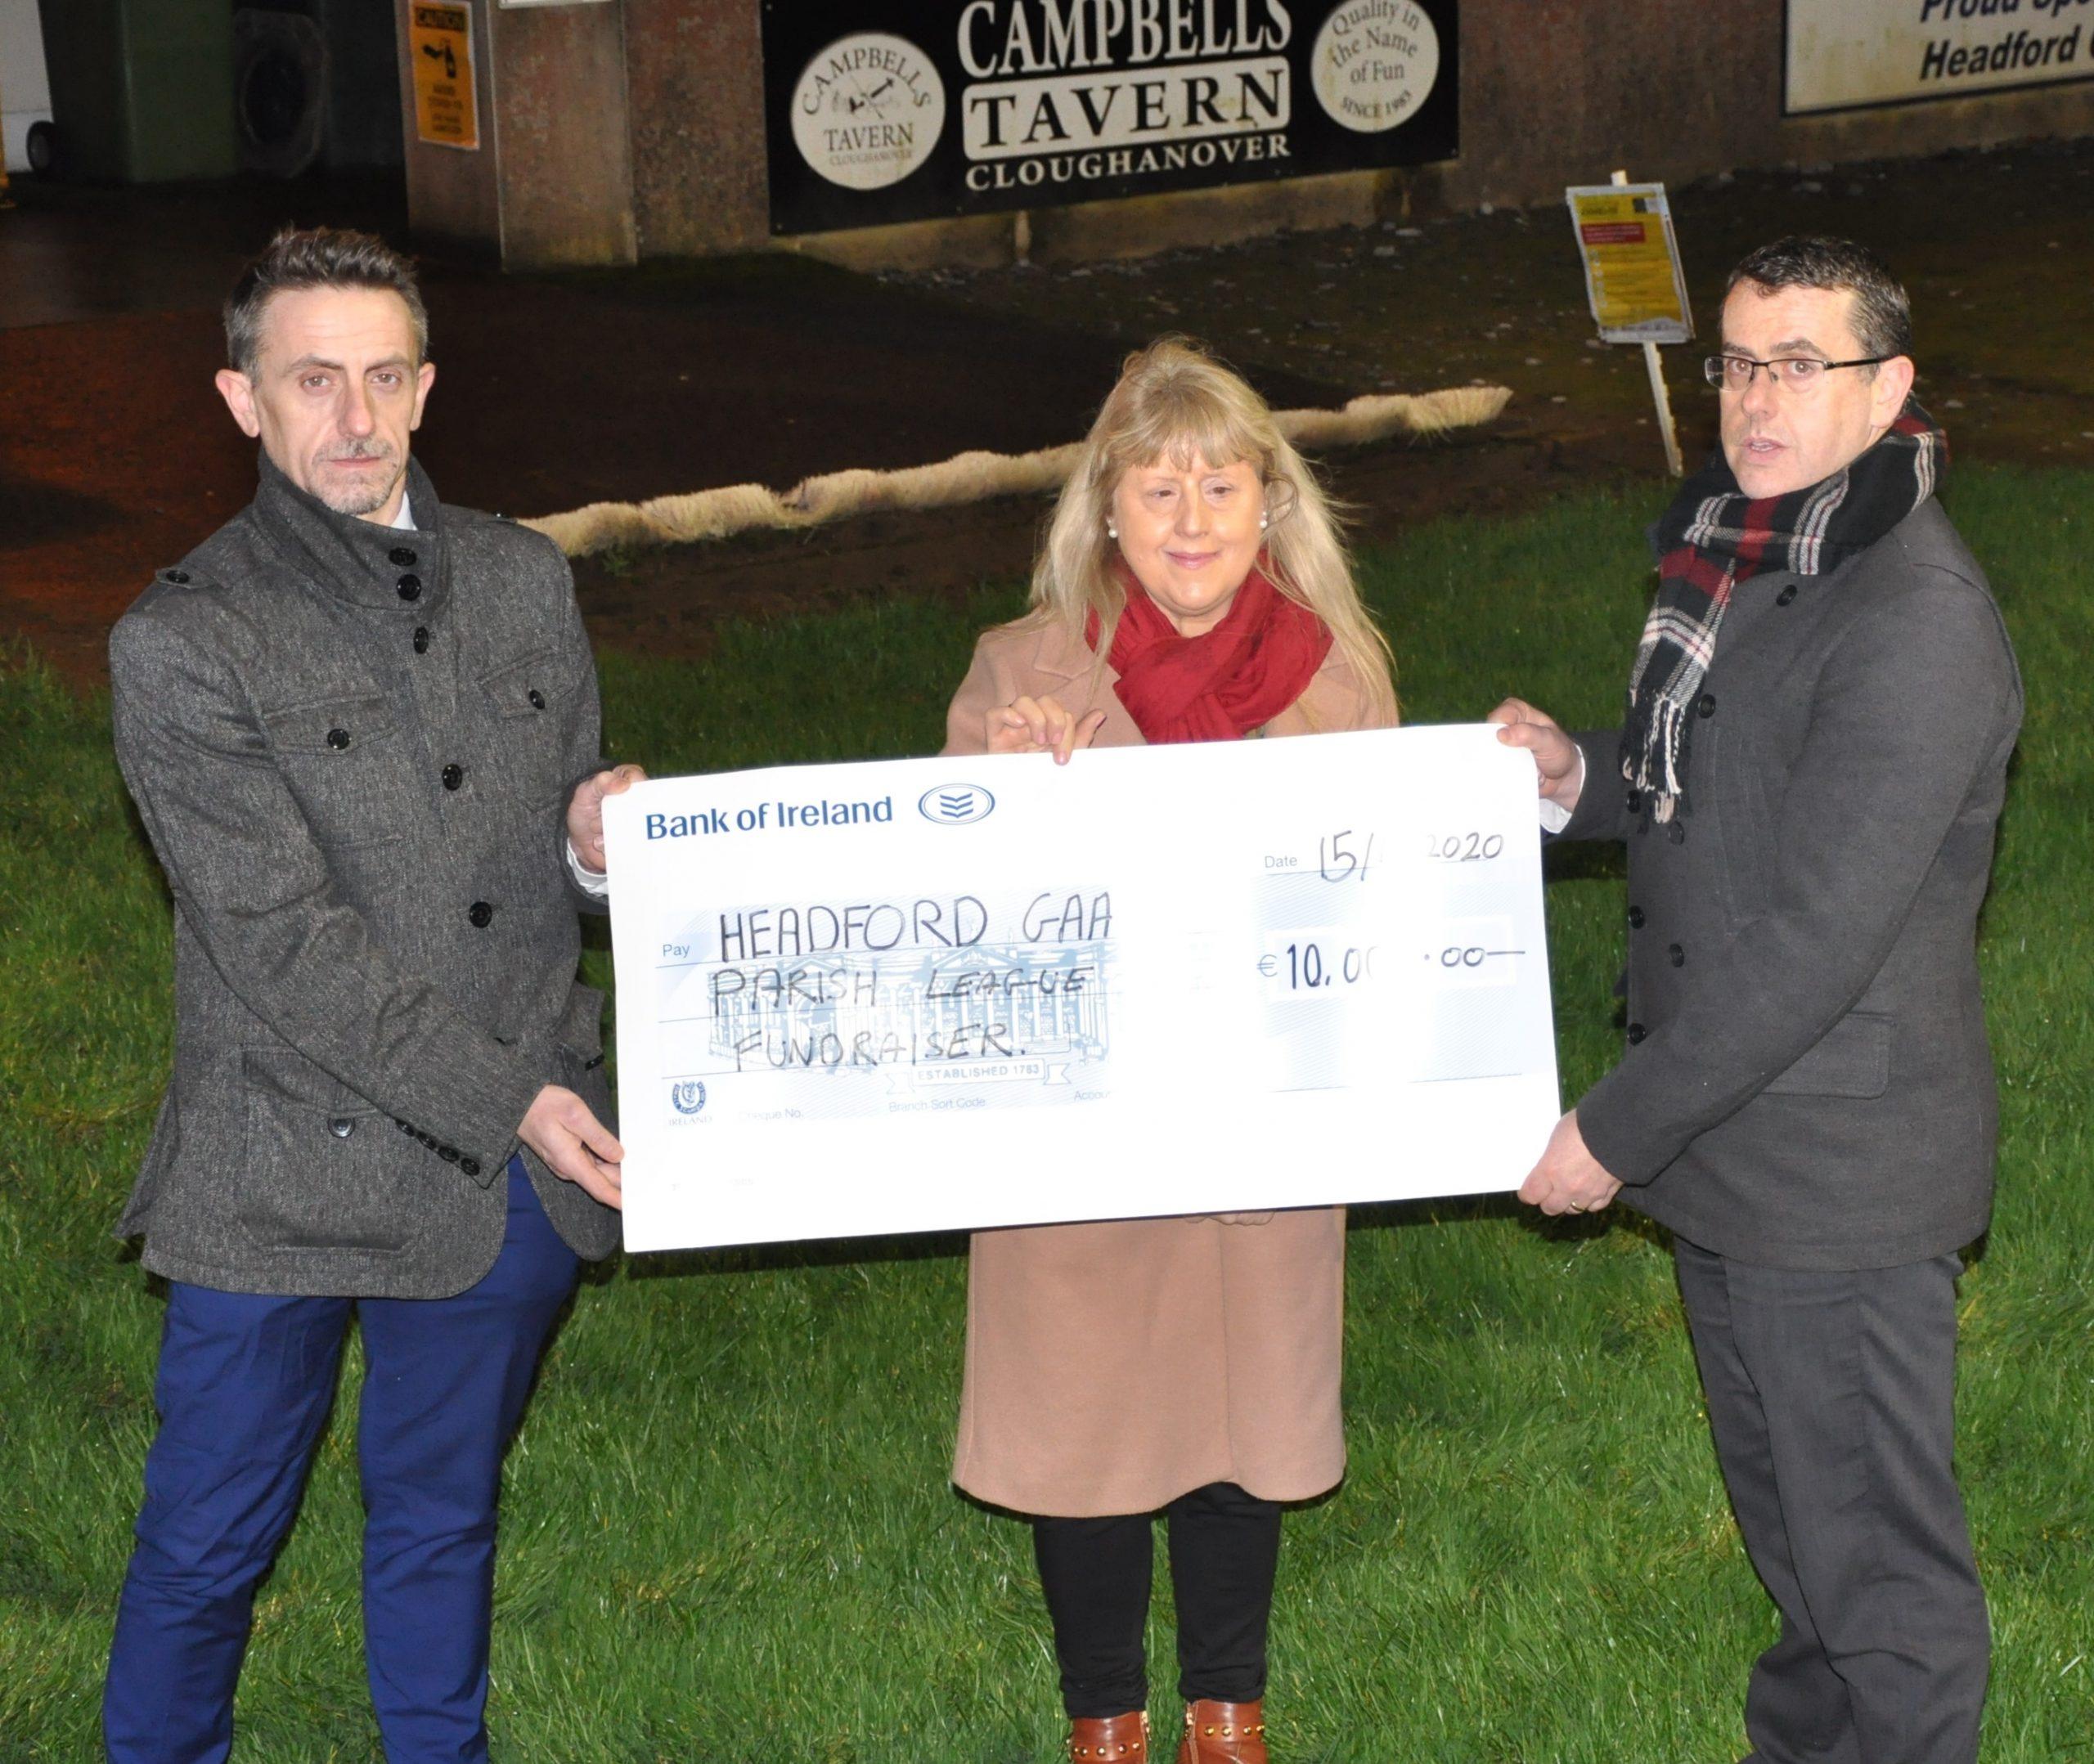 TJ Keady Parish League 2019 Donation